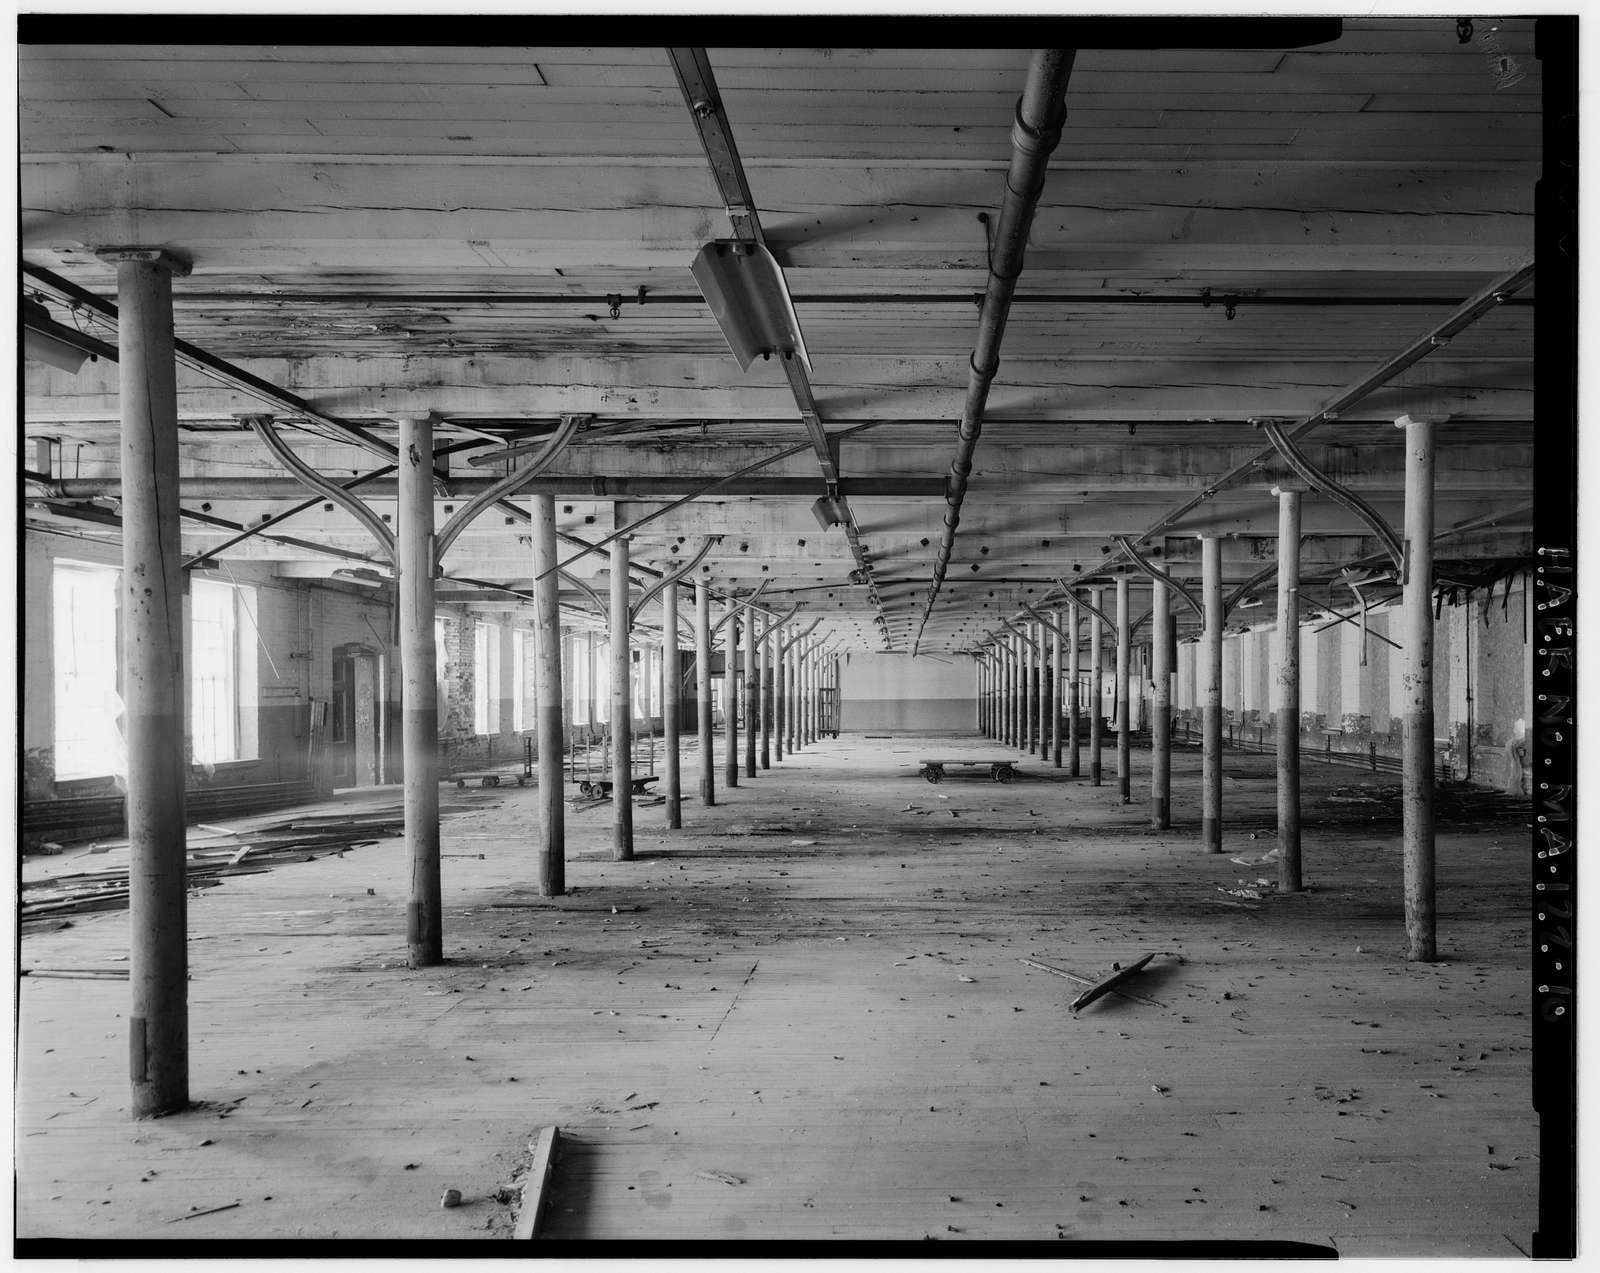 Renfrew Manufacturing Company Mill No. 2, 217 Columbia Street, Adams, Berkshire County, MA